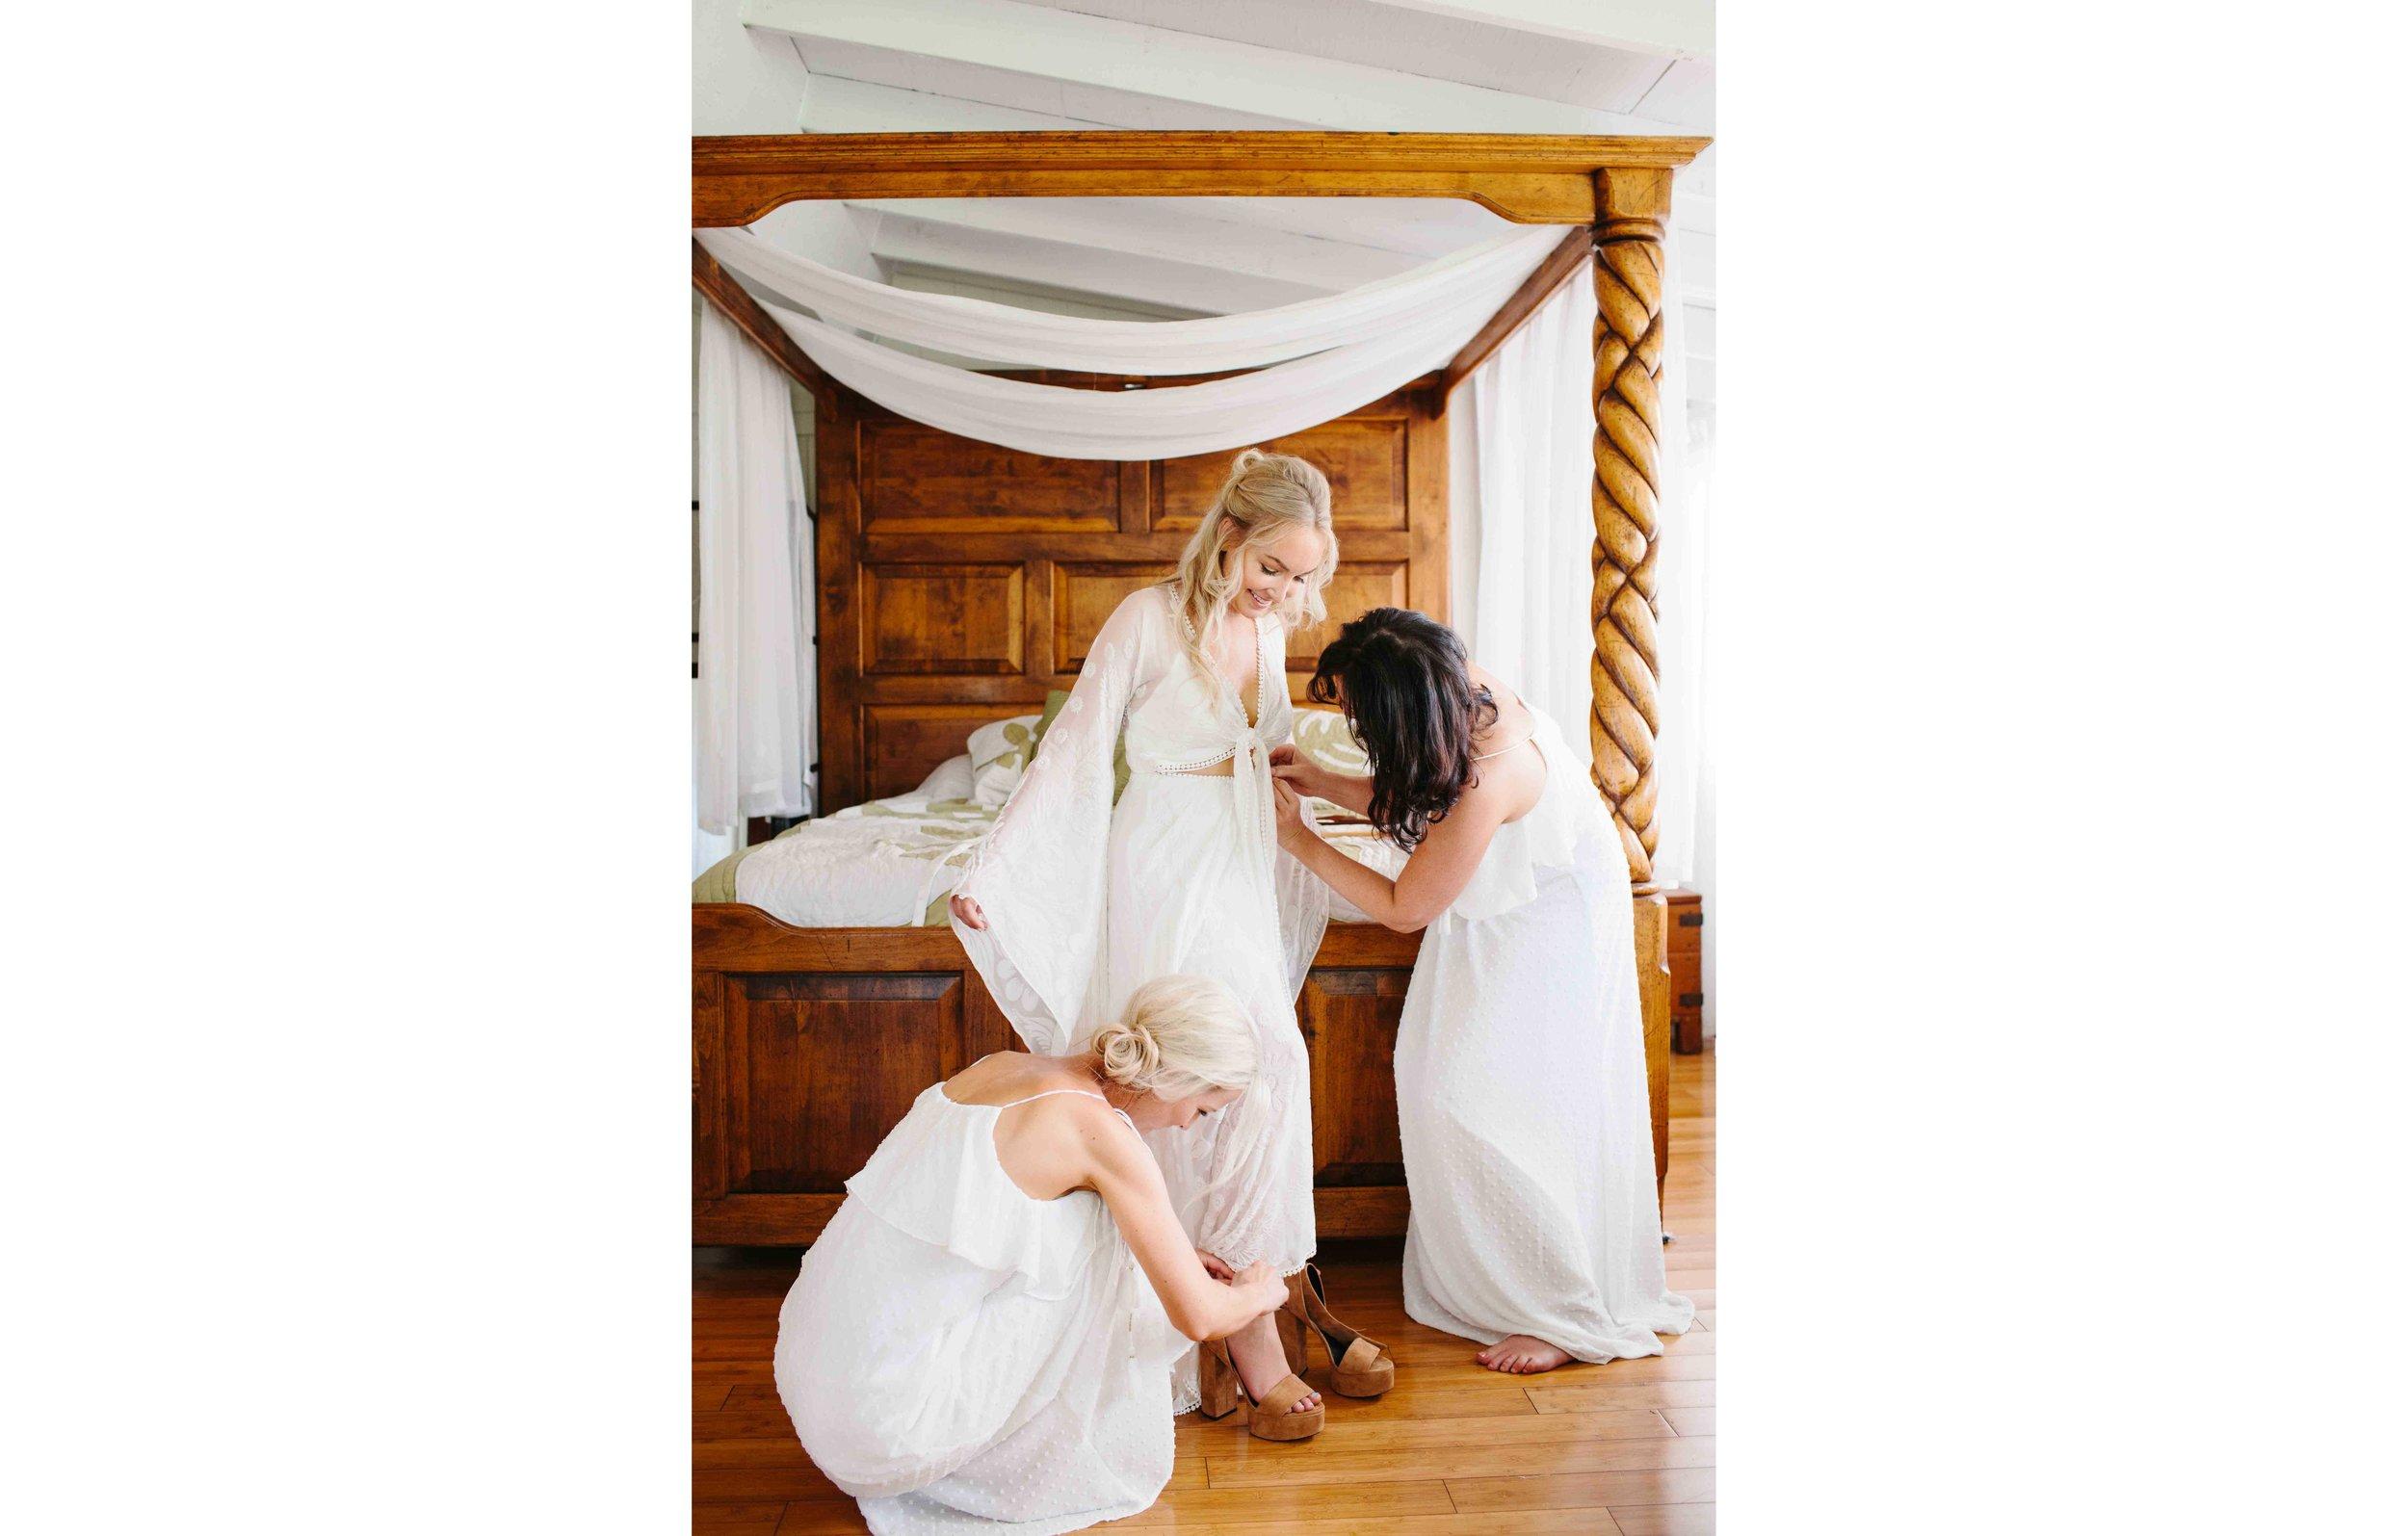 Oahu Wedding Photography of a Bride Getting Ready